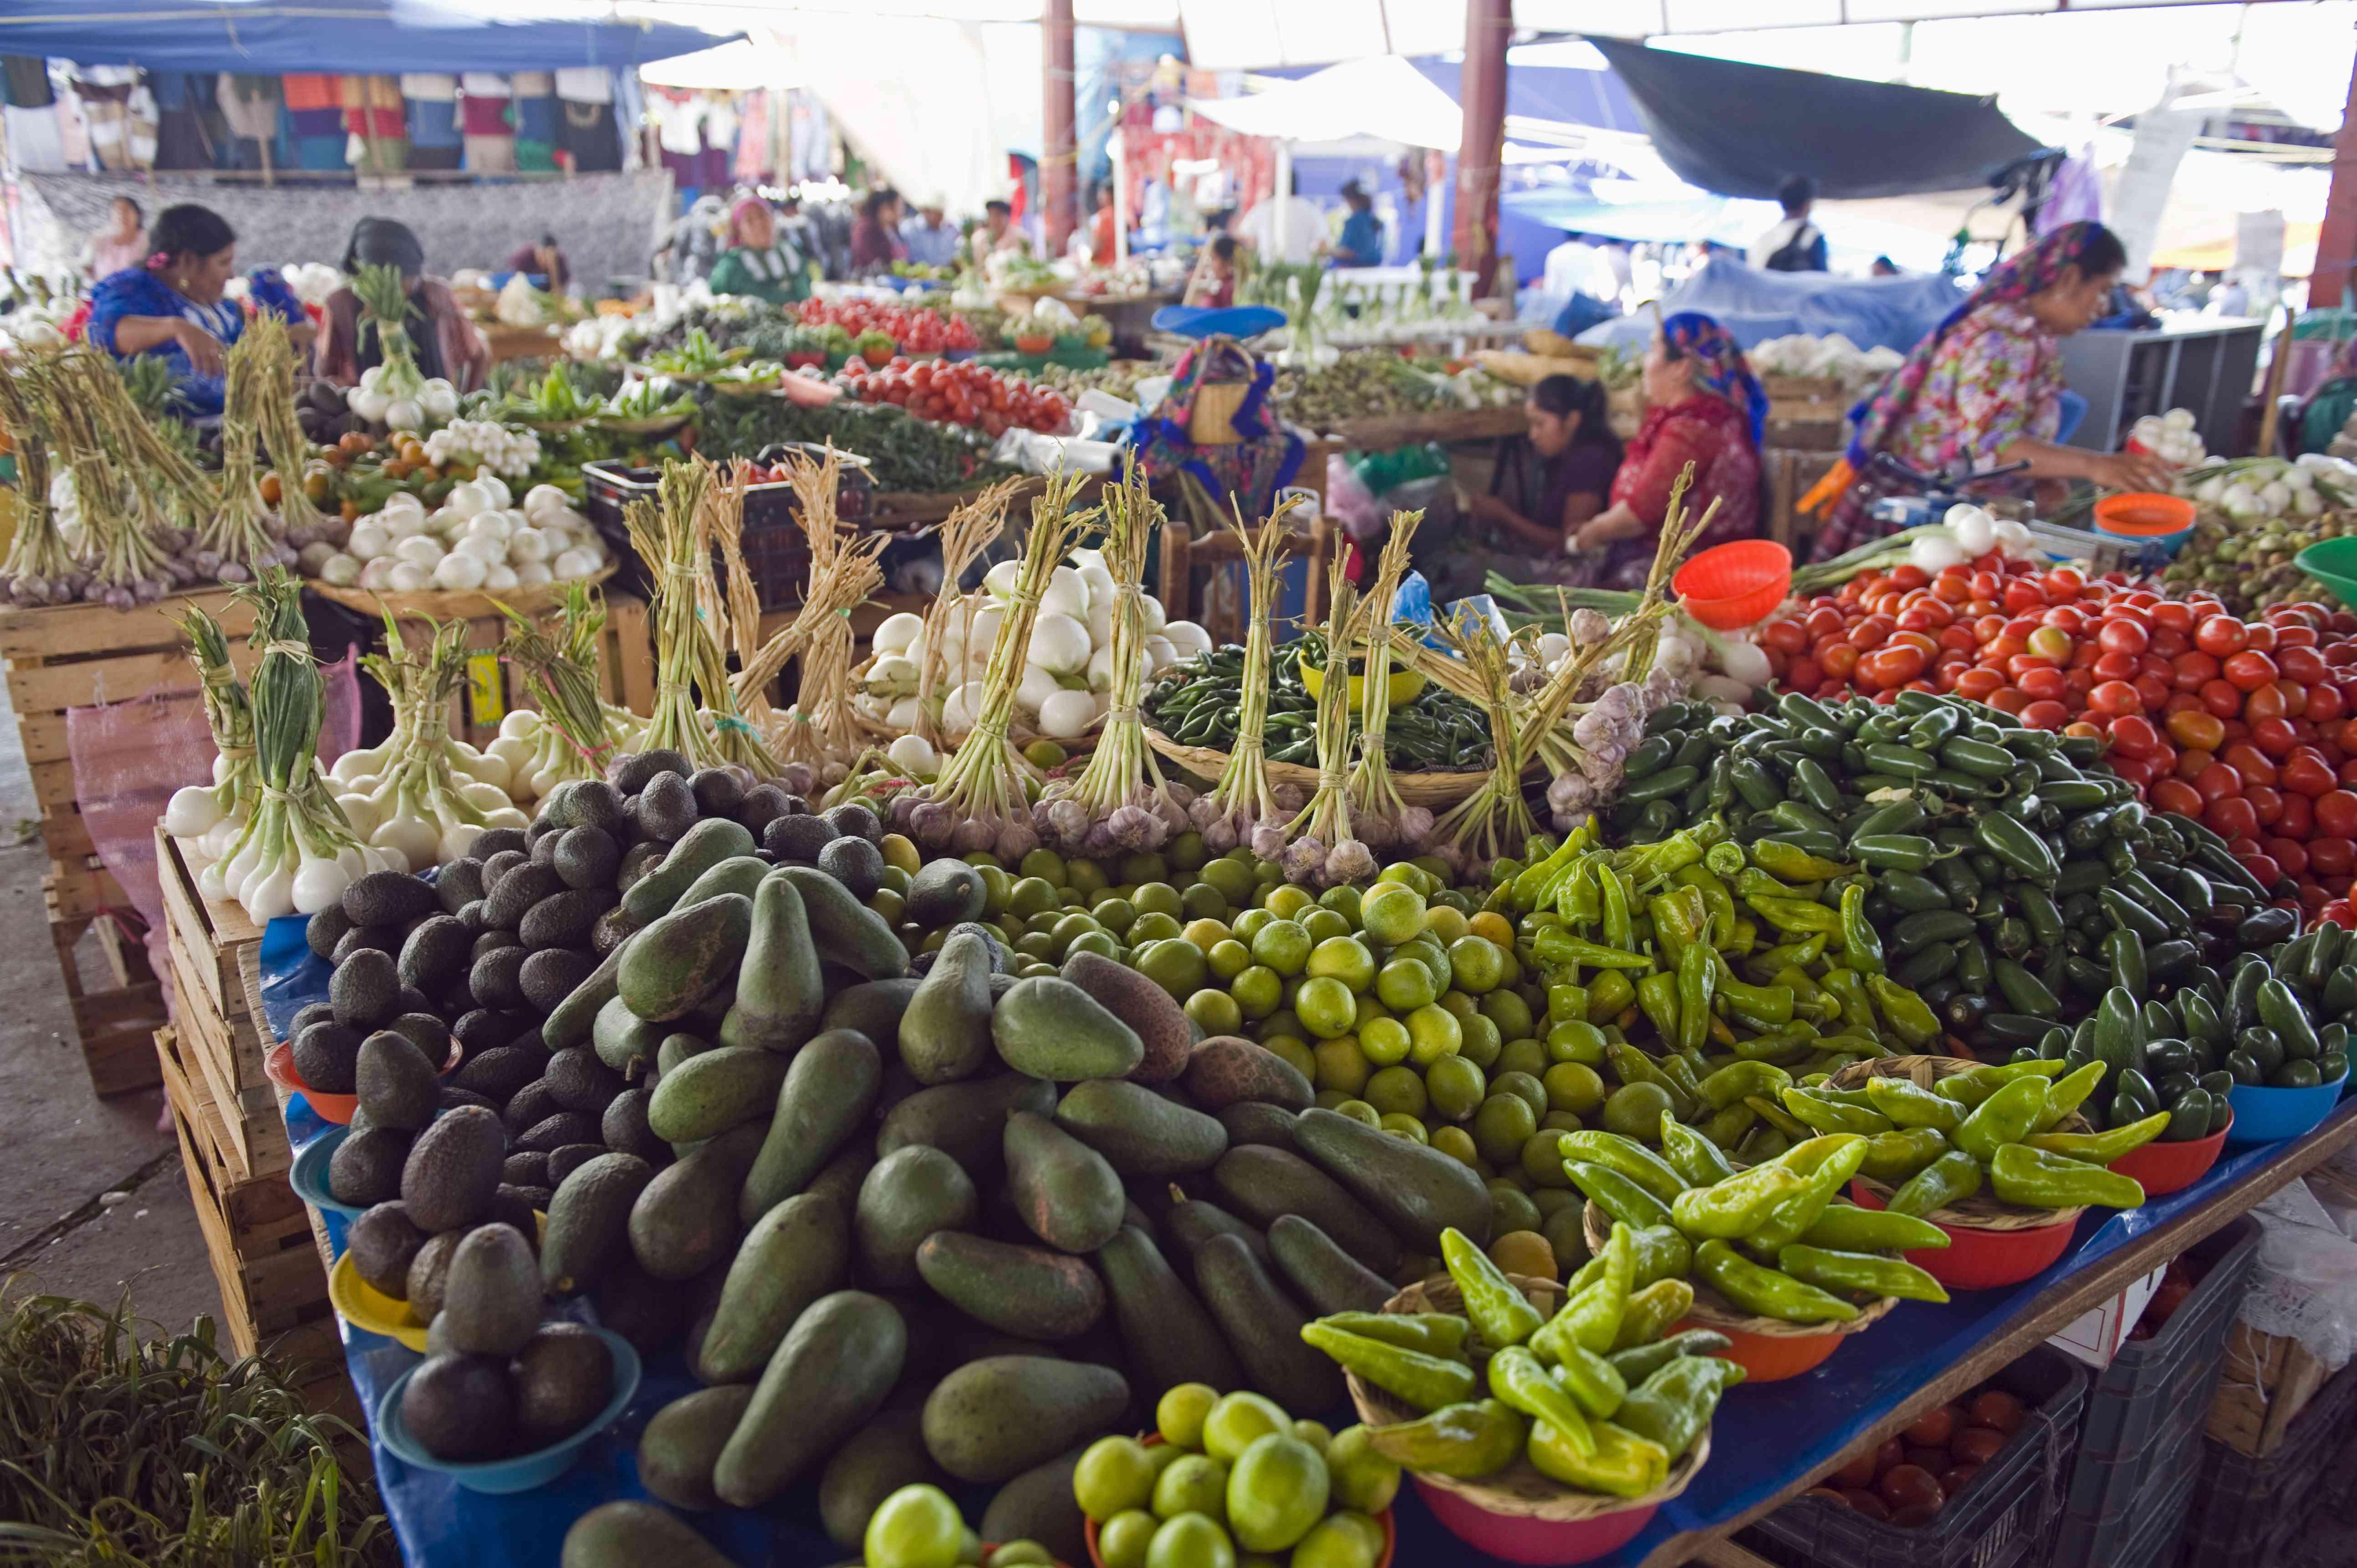 Tlacolula Sunday market, Oaxaca state, Mexico, North America